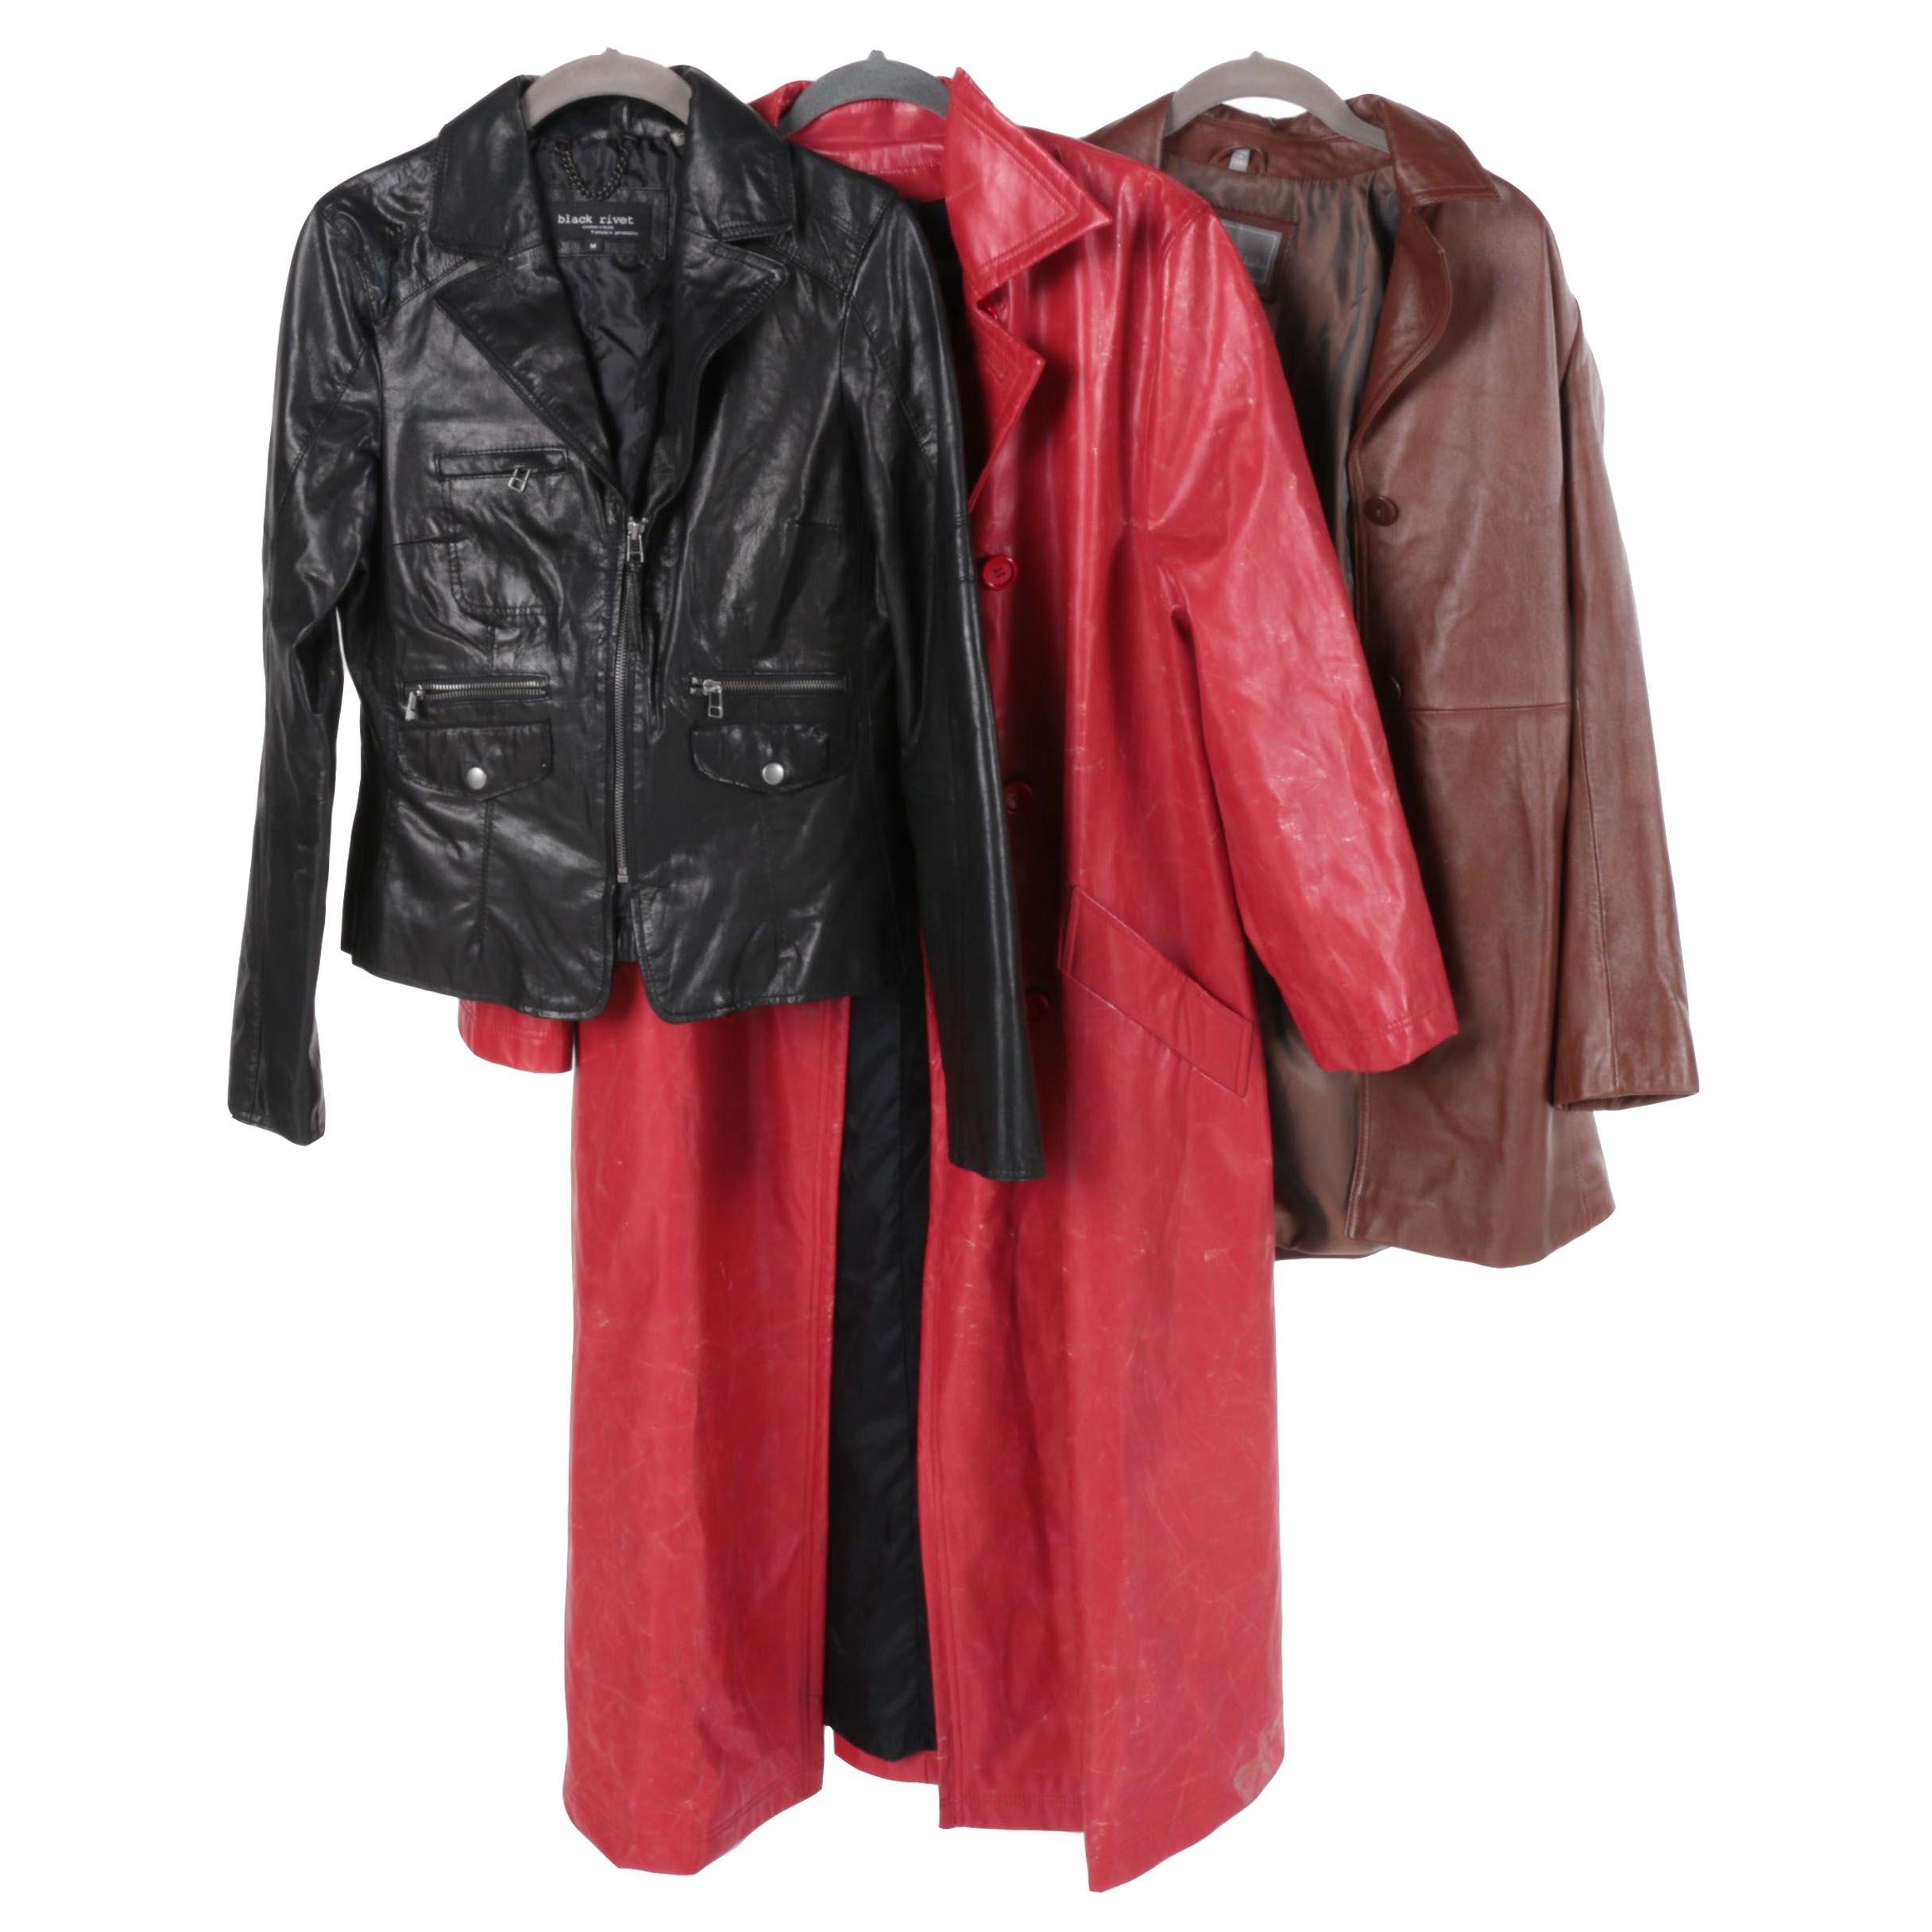 Women's Leather Jackets and Coats Including Harve Benard by Bernard Holtzman